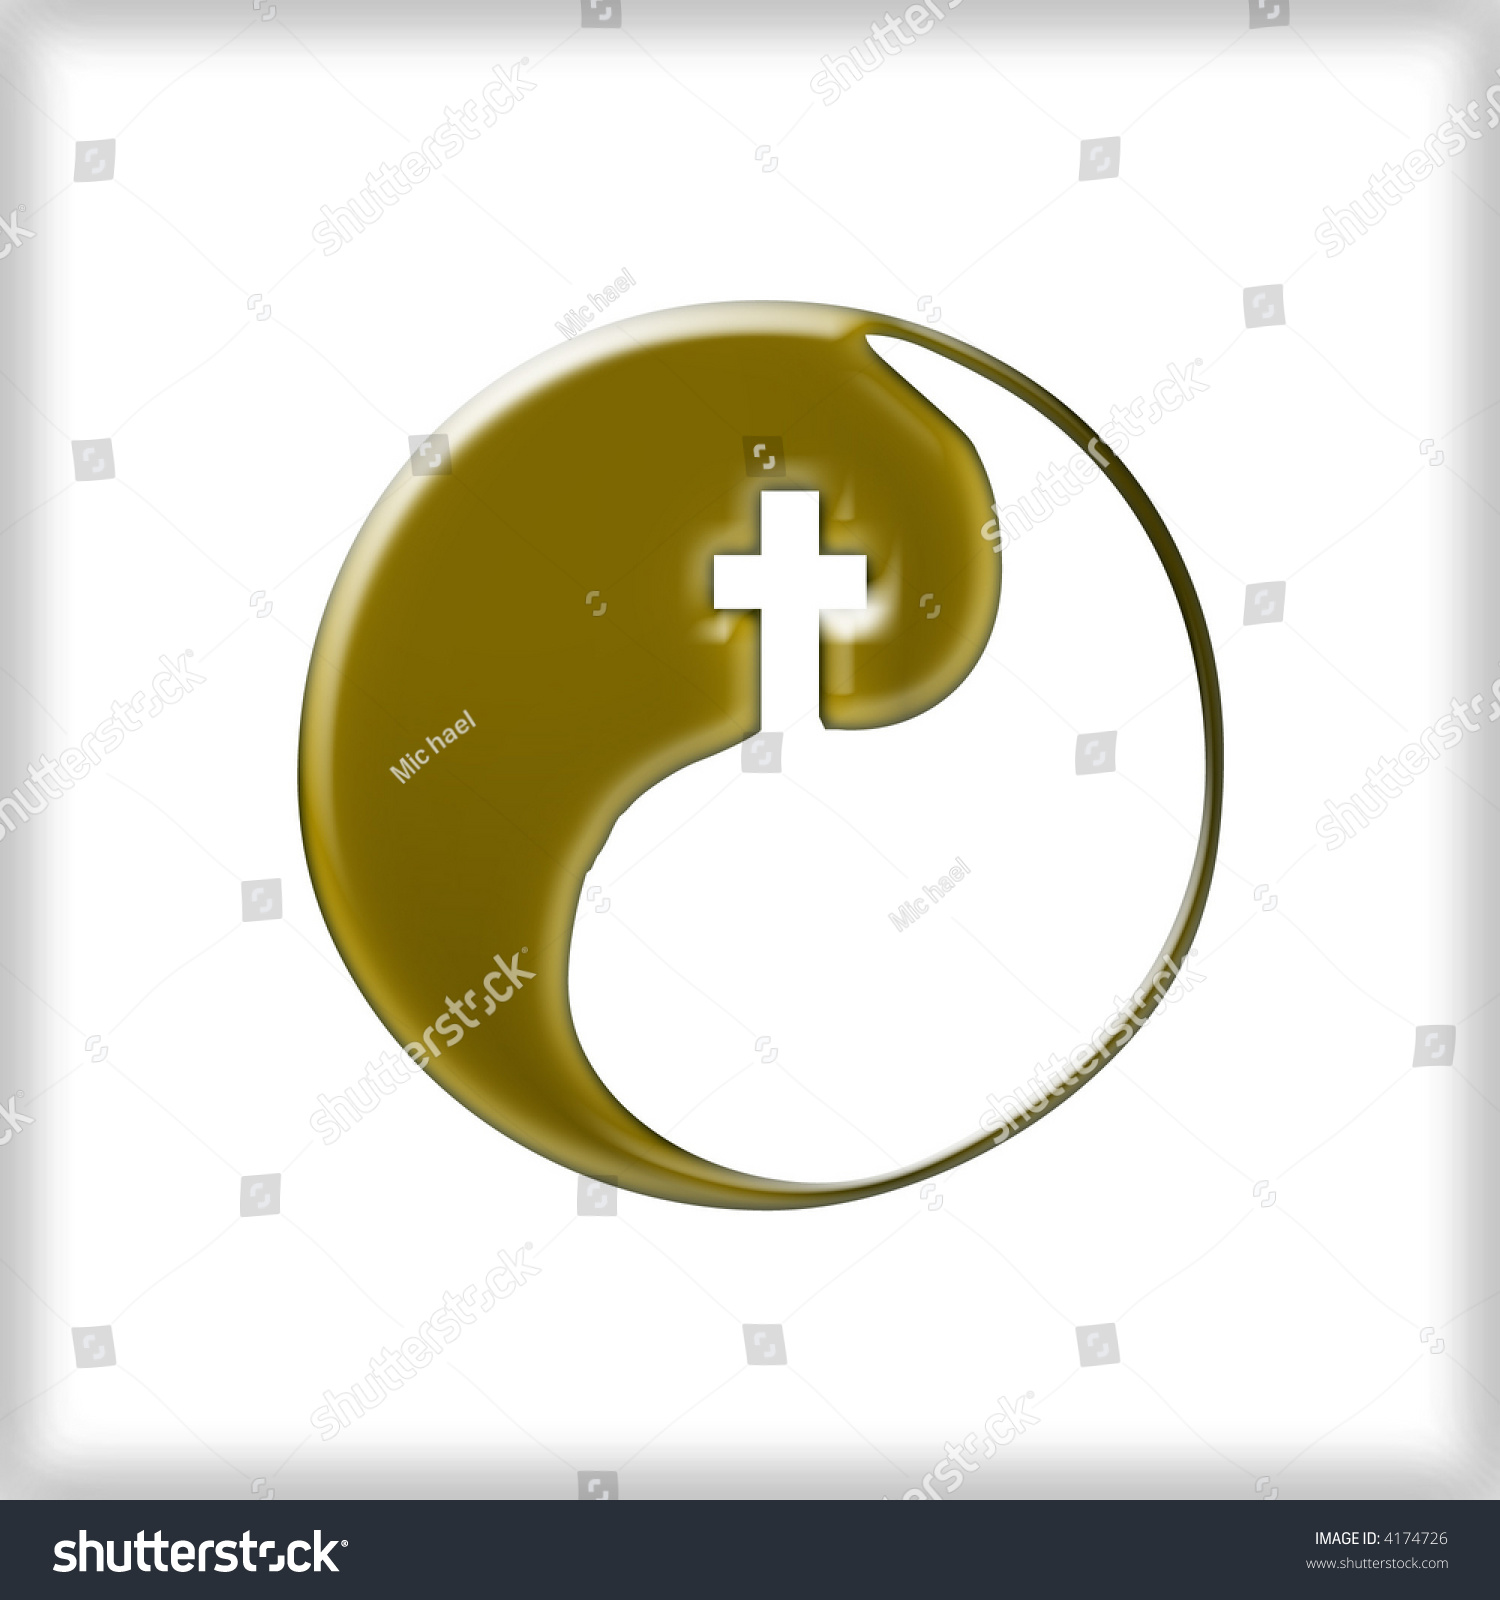 The tao symbol image collections symbol and sign ideas 3d tao symbol yin yang cross stock illustration 4174726 shutterstock 3d tao symbol yin and yang buycottarizona